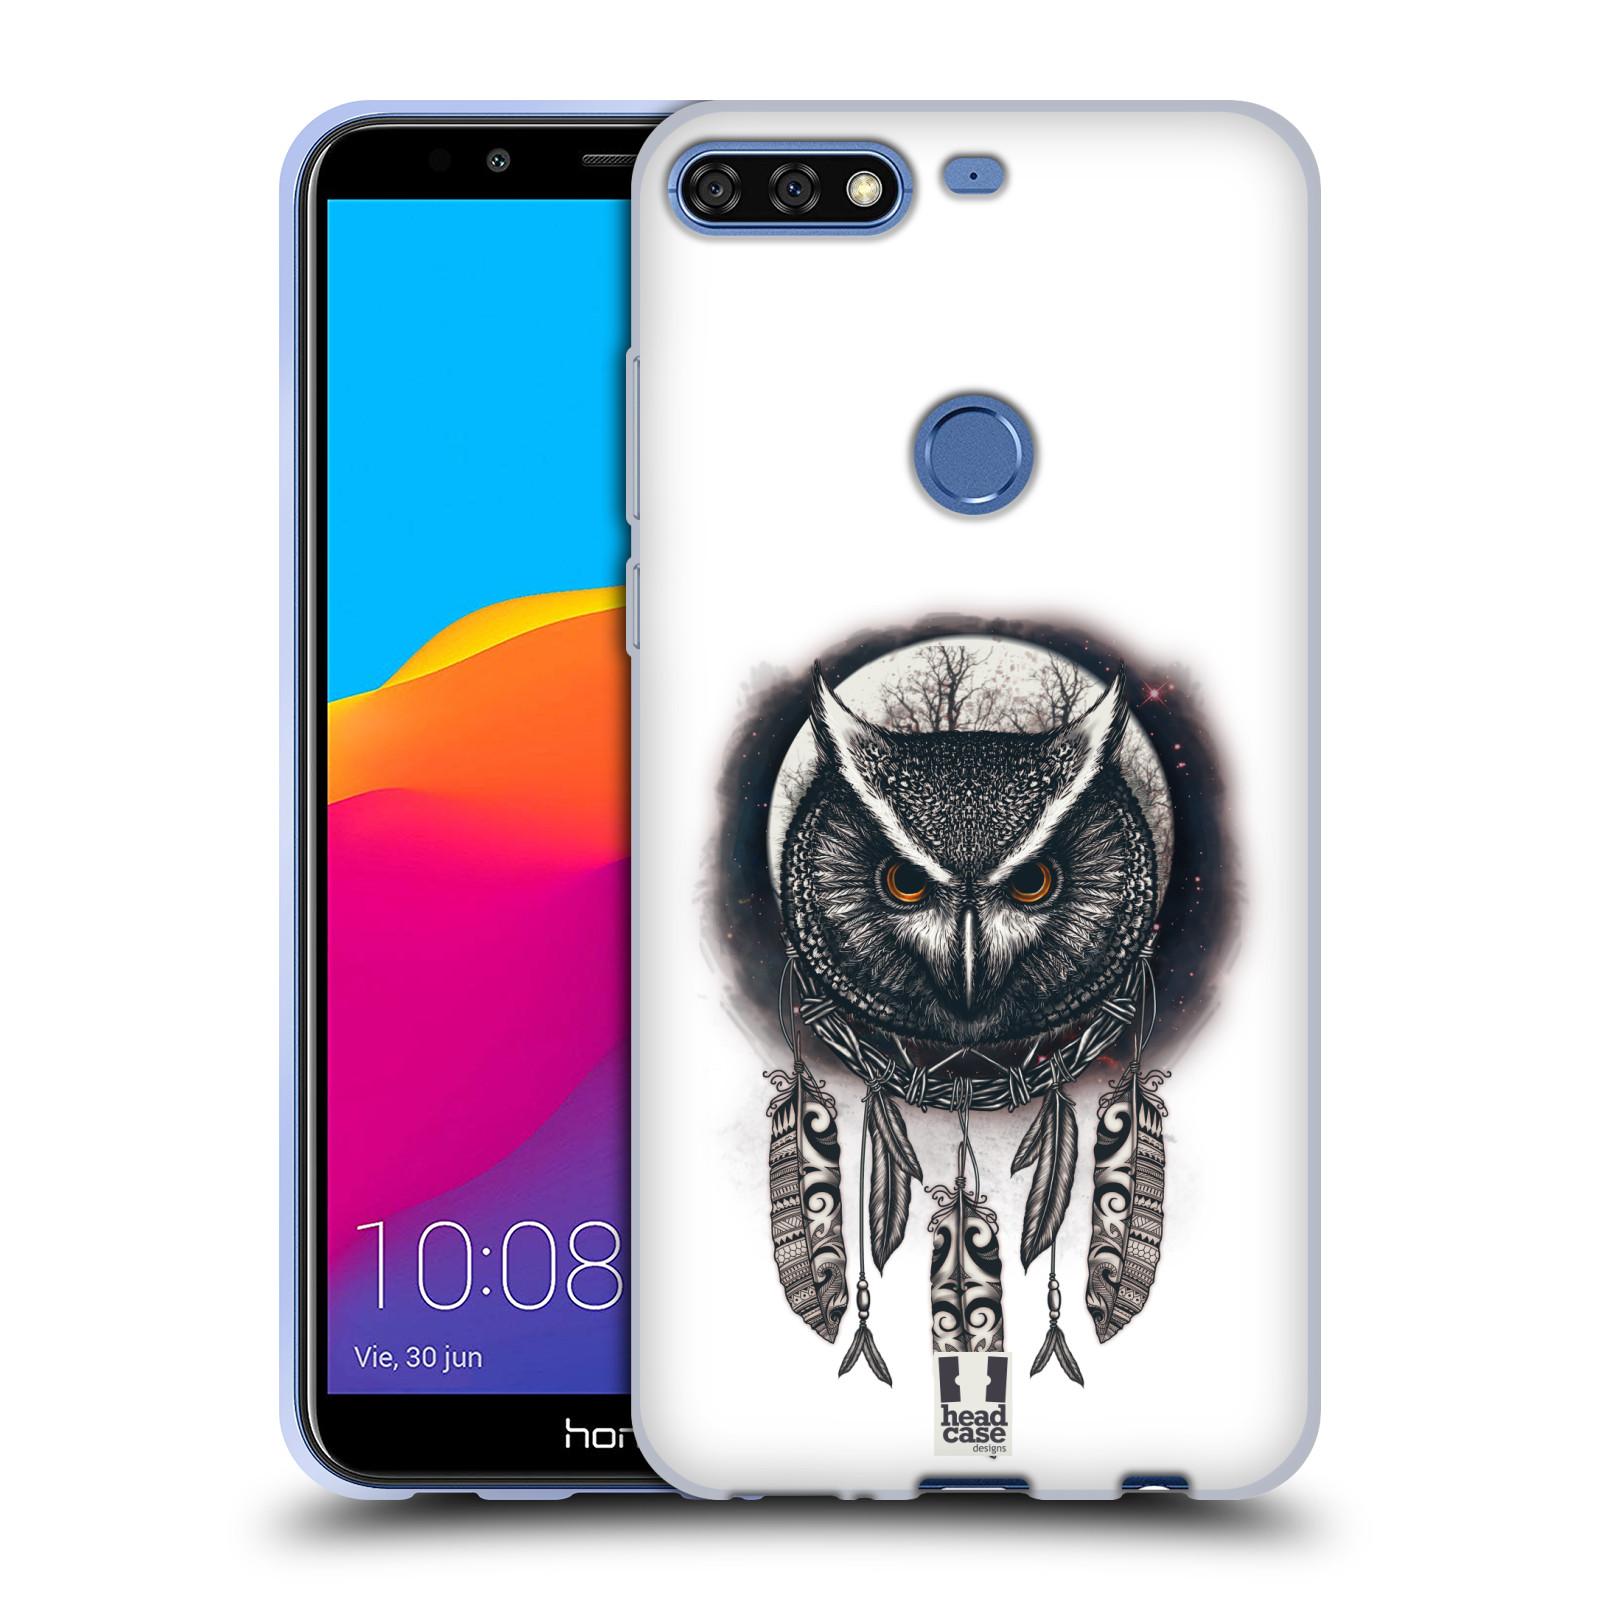 Silikonové pouzdro na mobil Huawei Y7 Prime (2018) - Head Case - Soví lapač